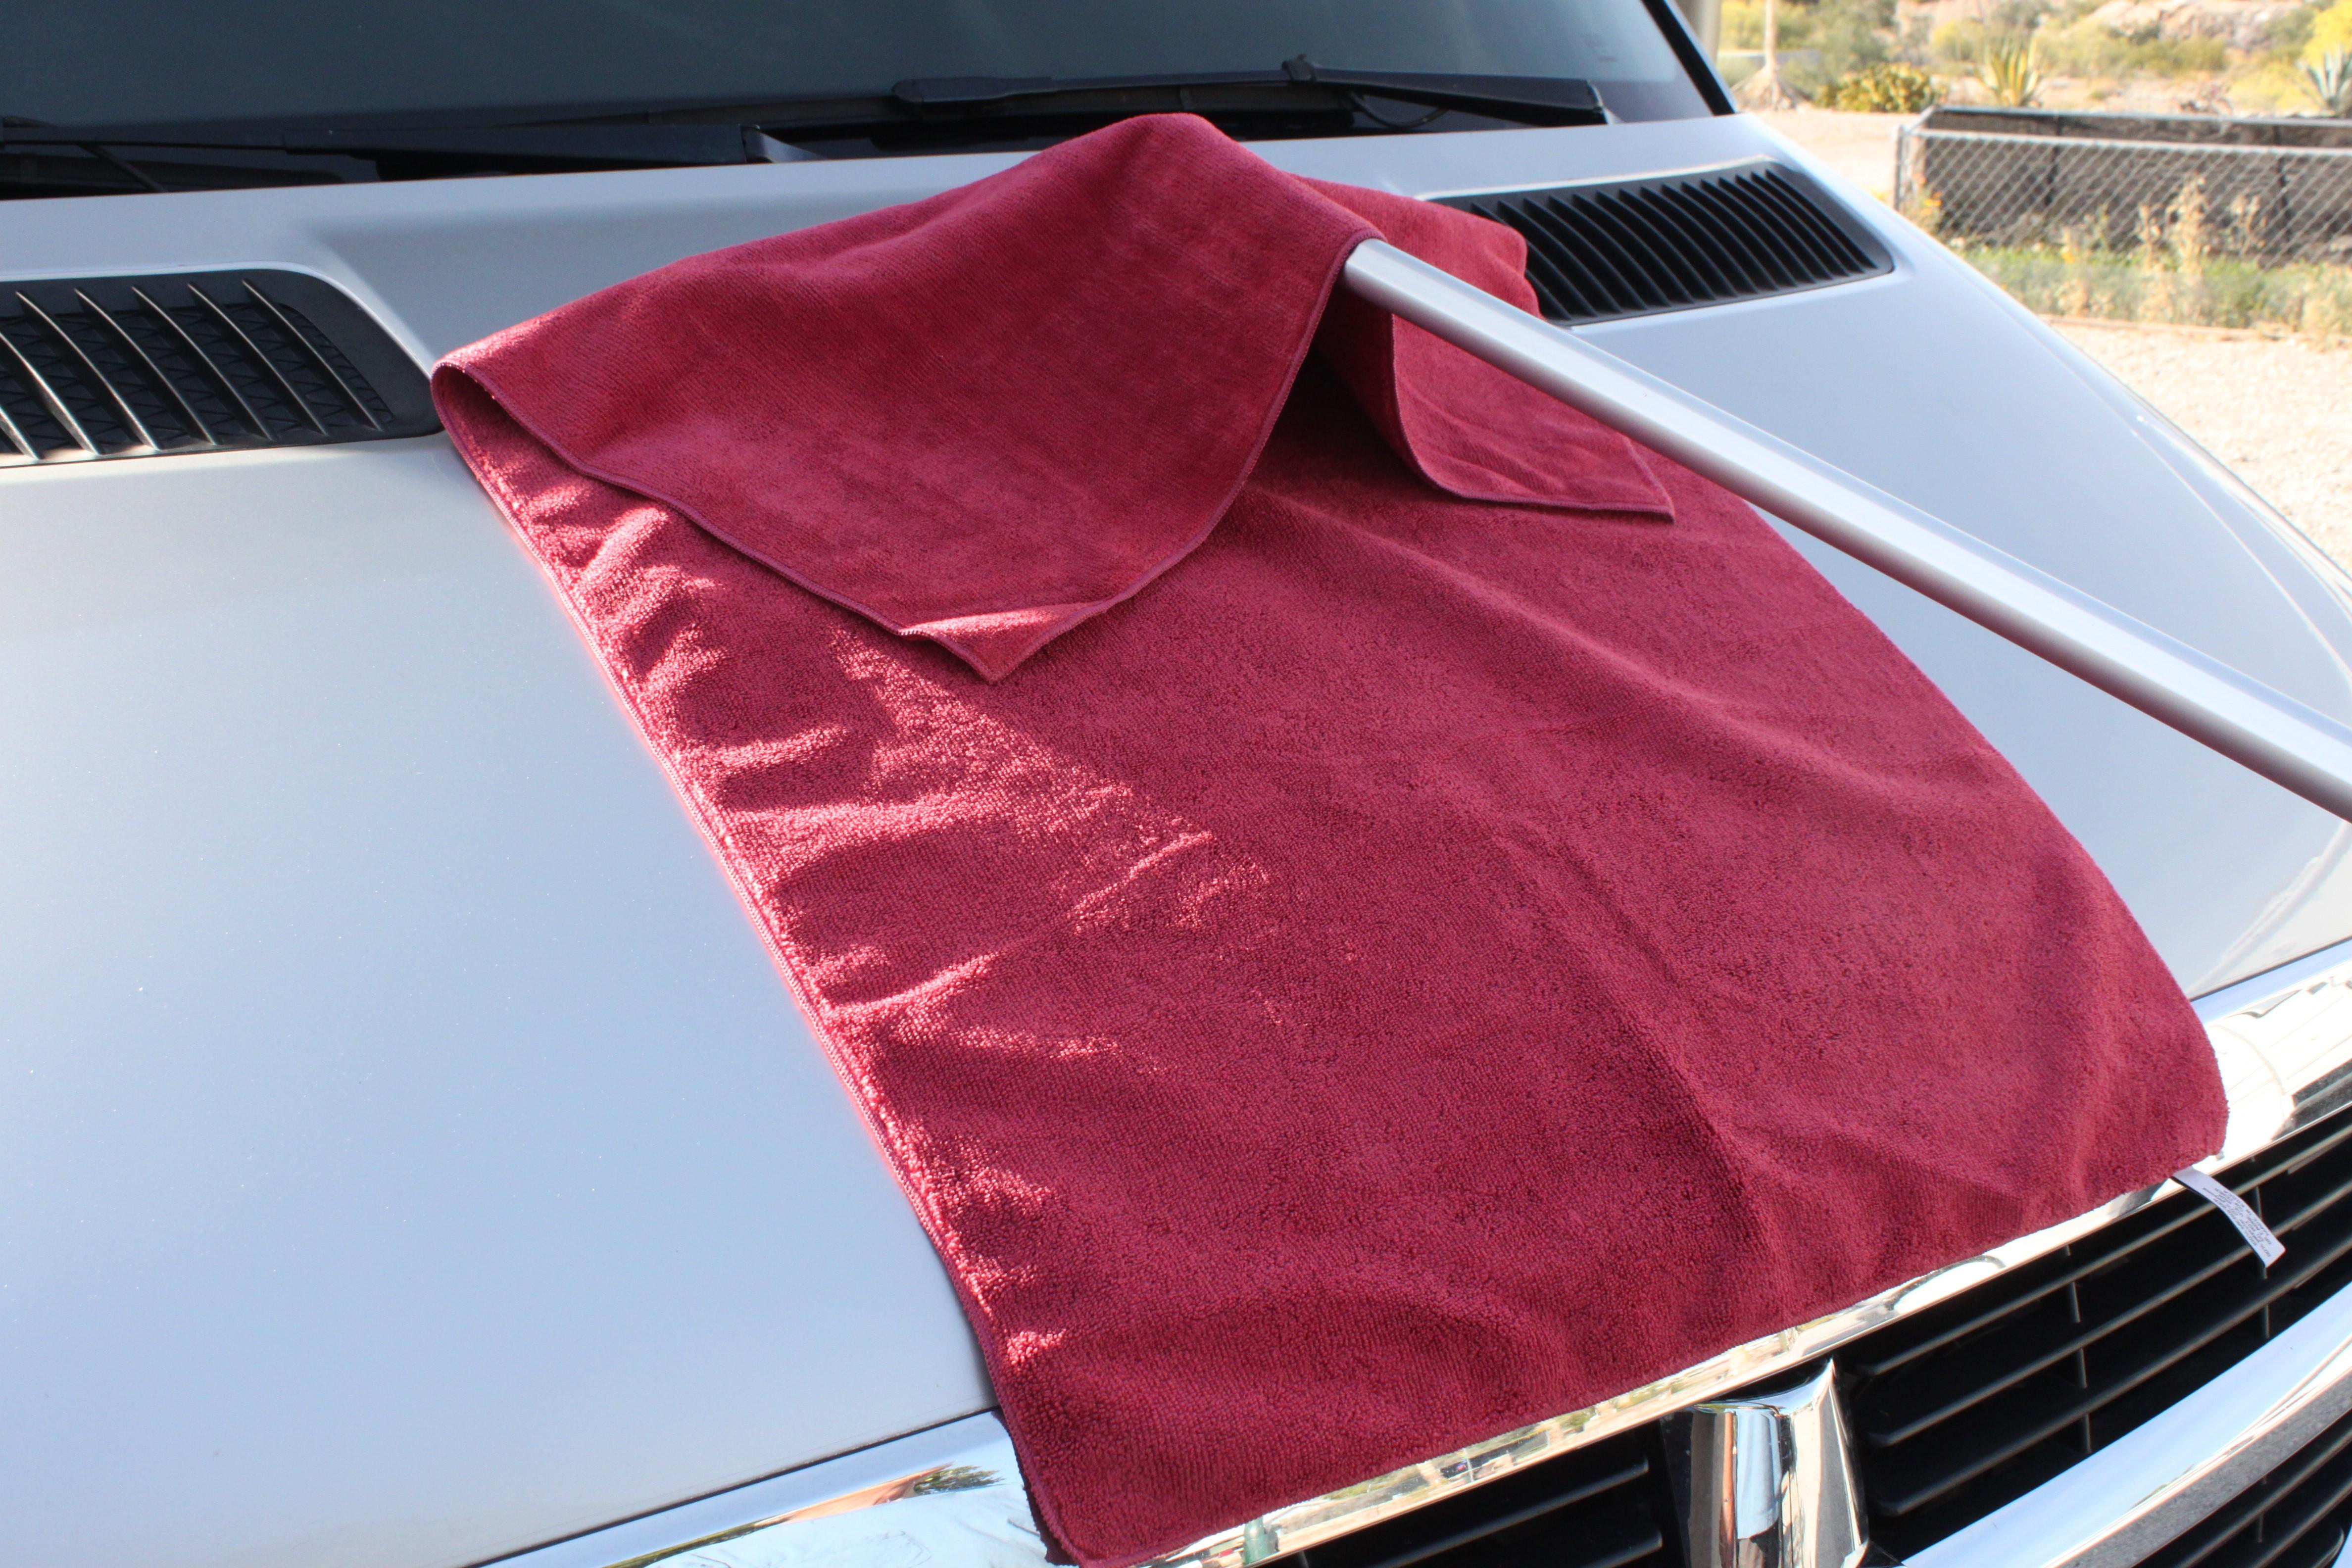 RV Drying Towel